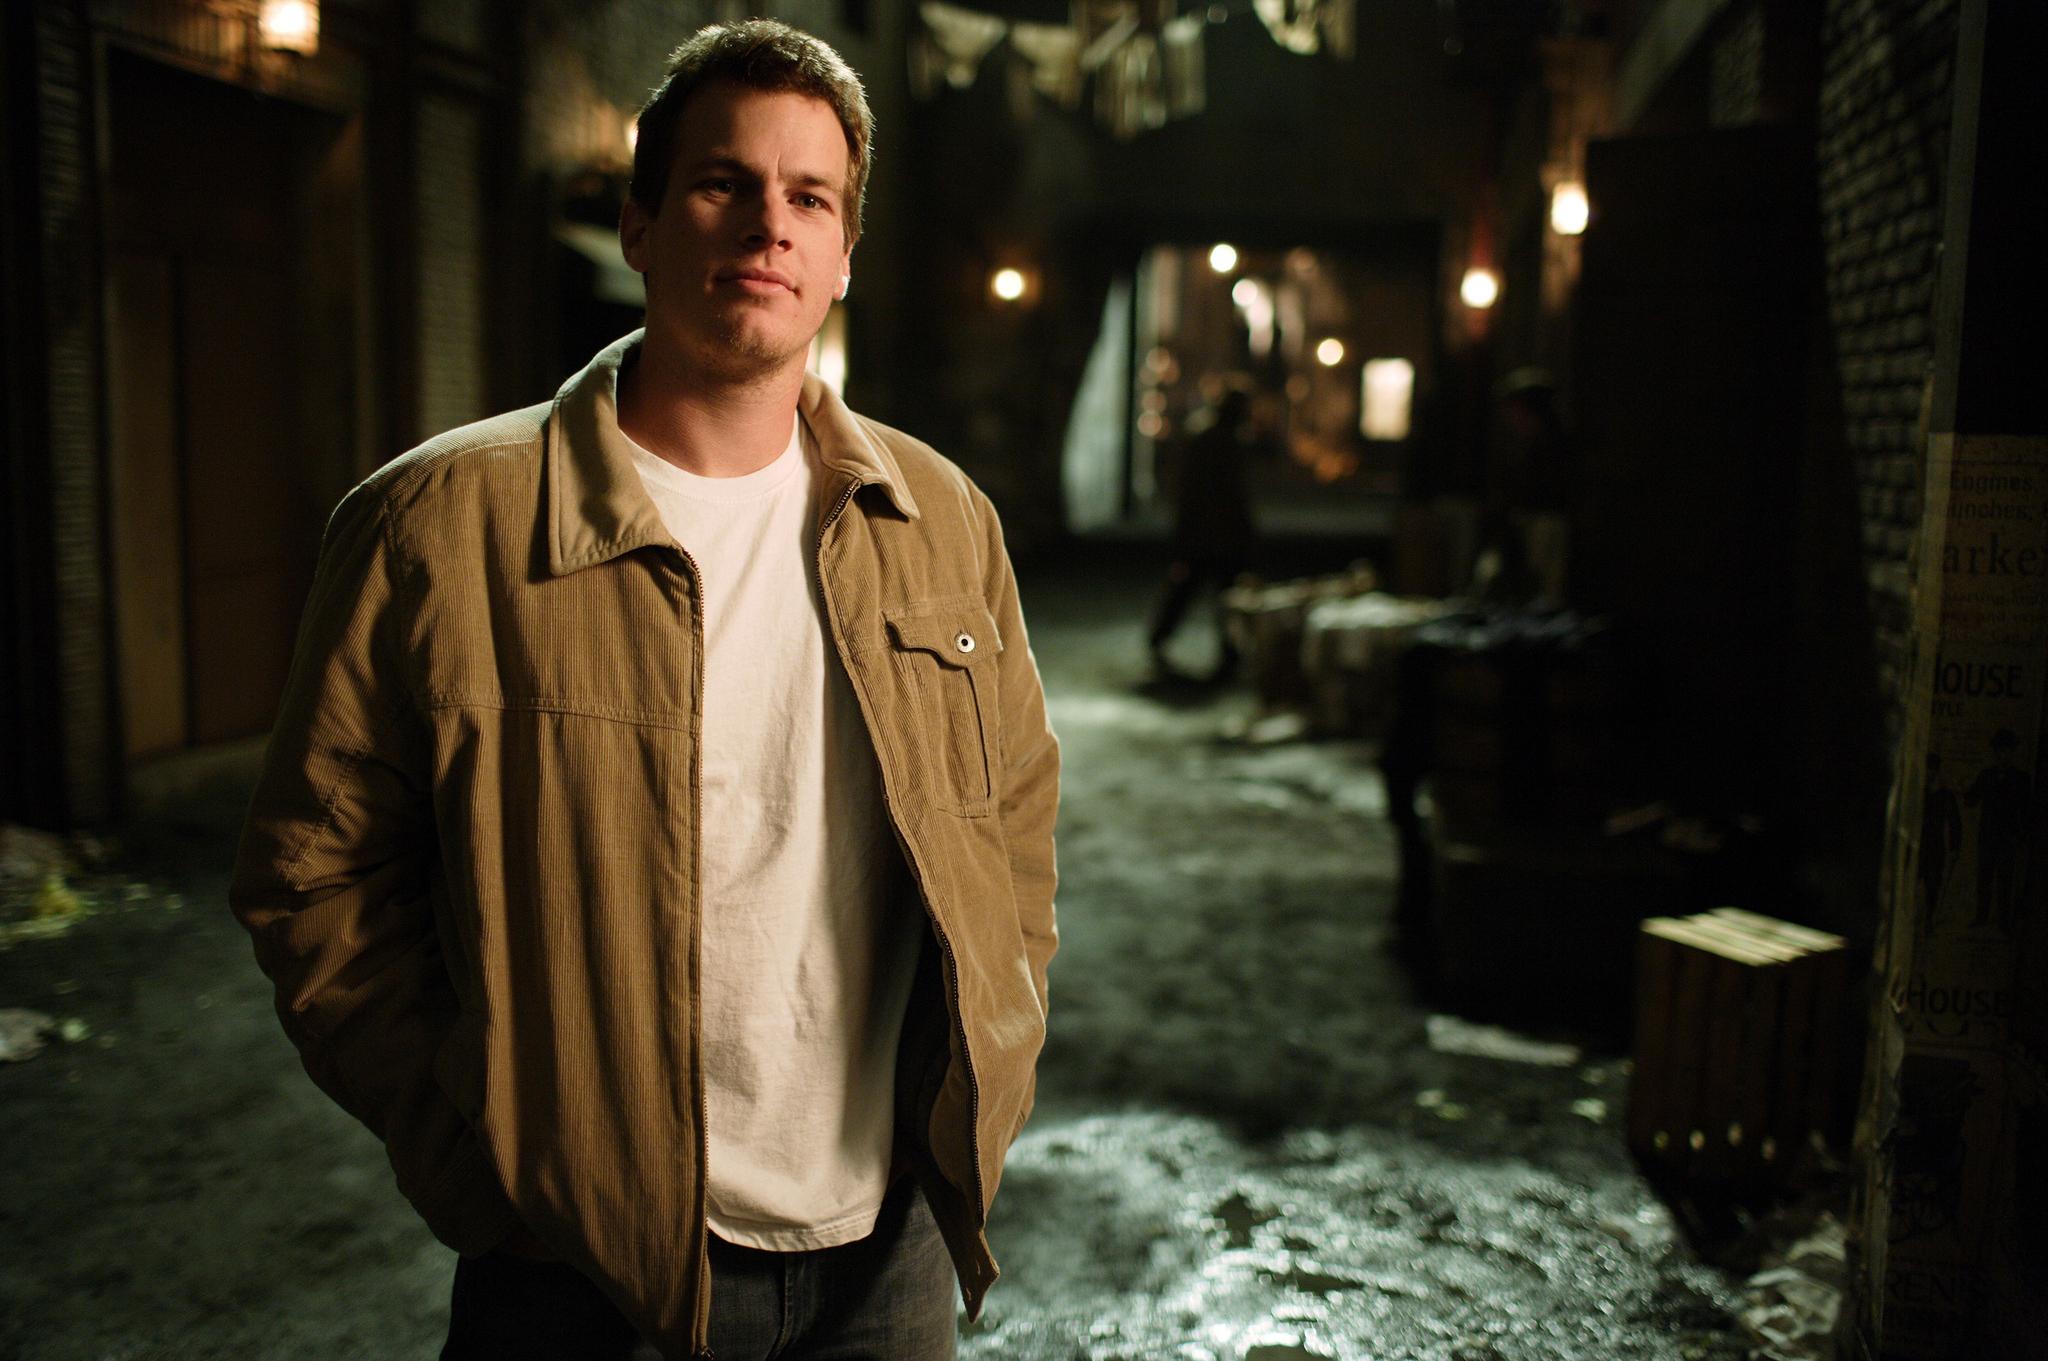 Jonathan Nolan in The Prestige (2006)